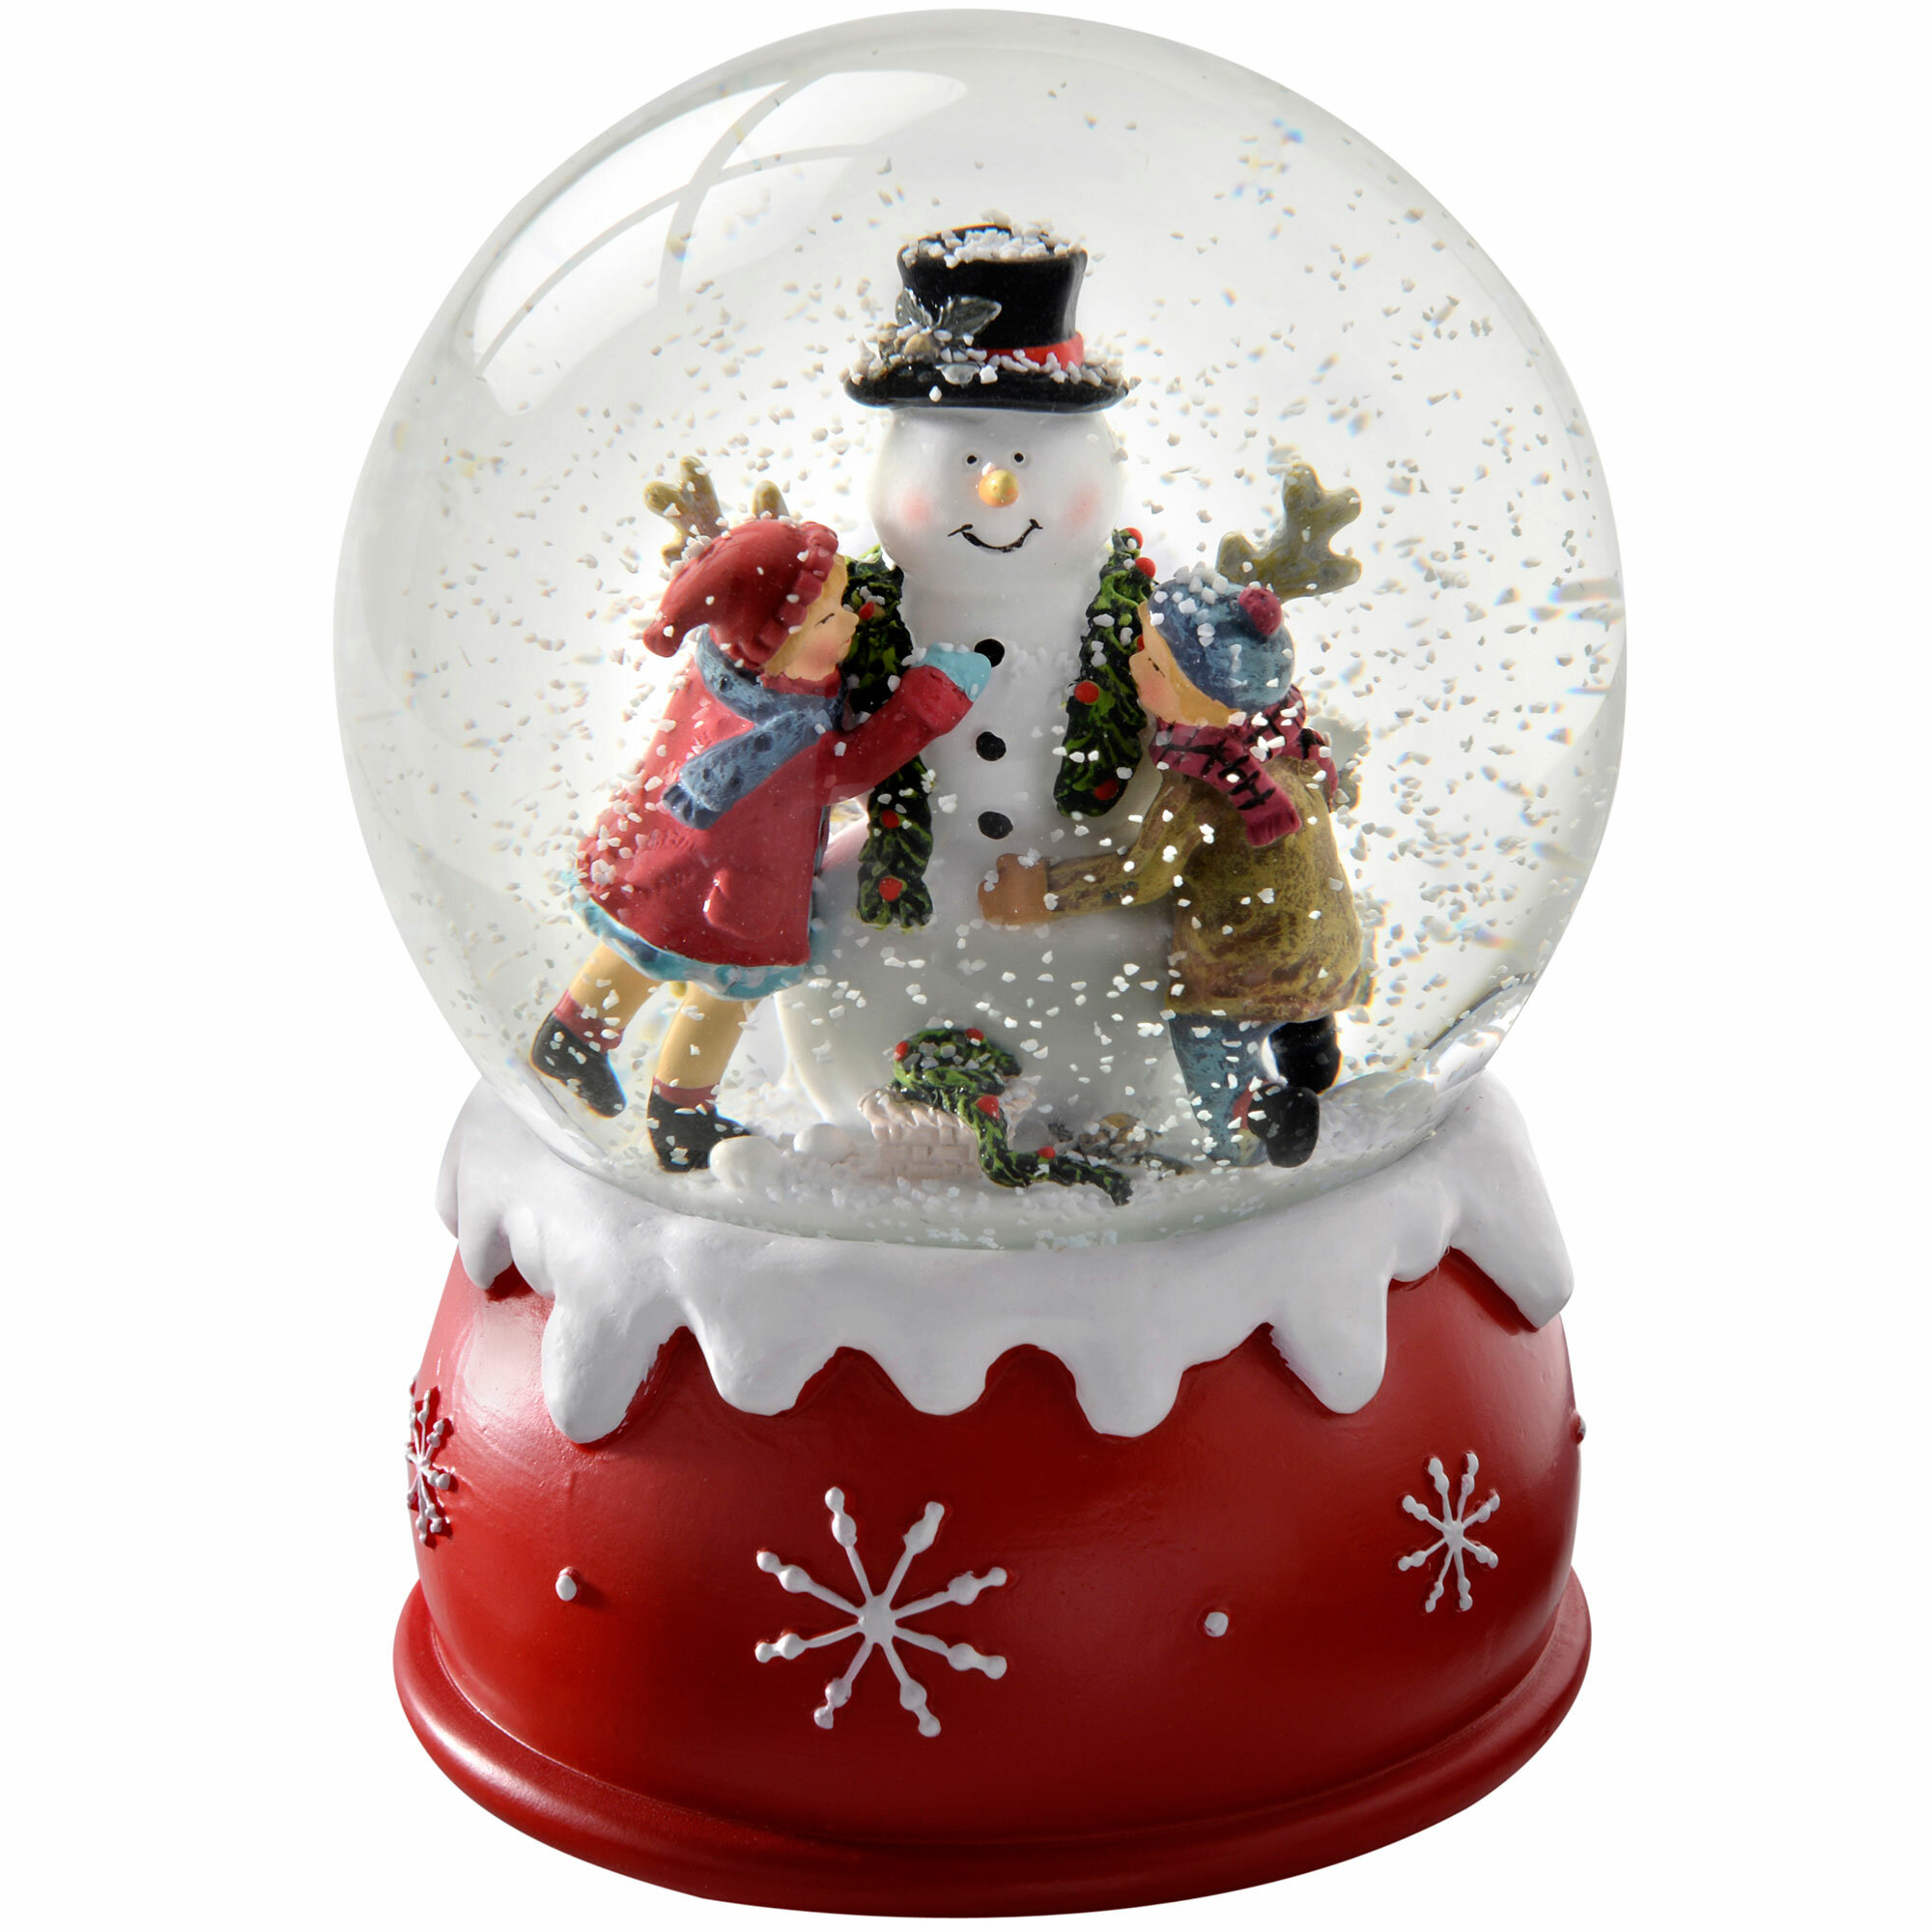 Christmas Snow.Children And Snowman Christmas Snow Globe